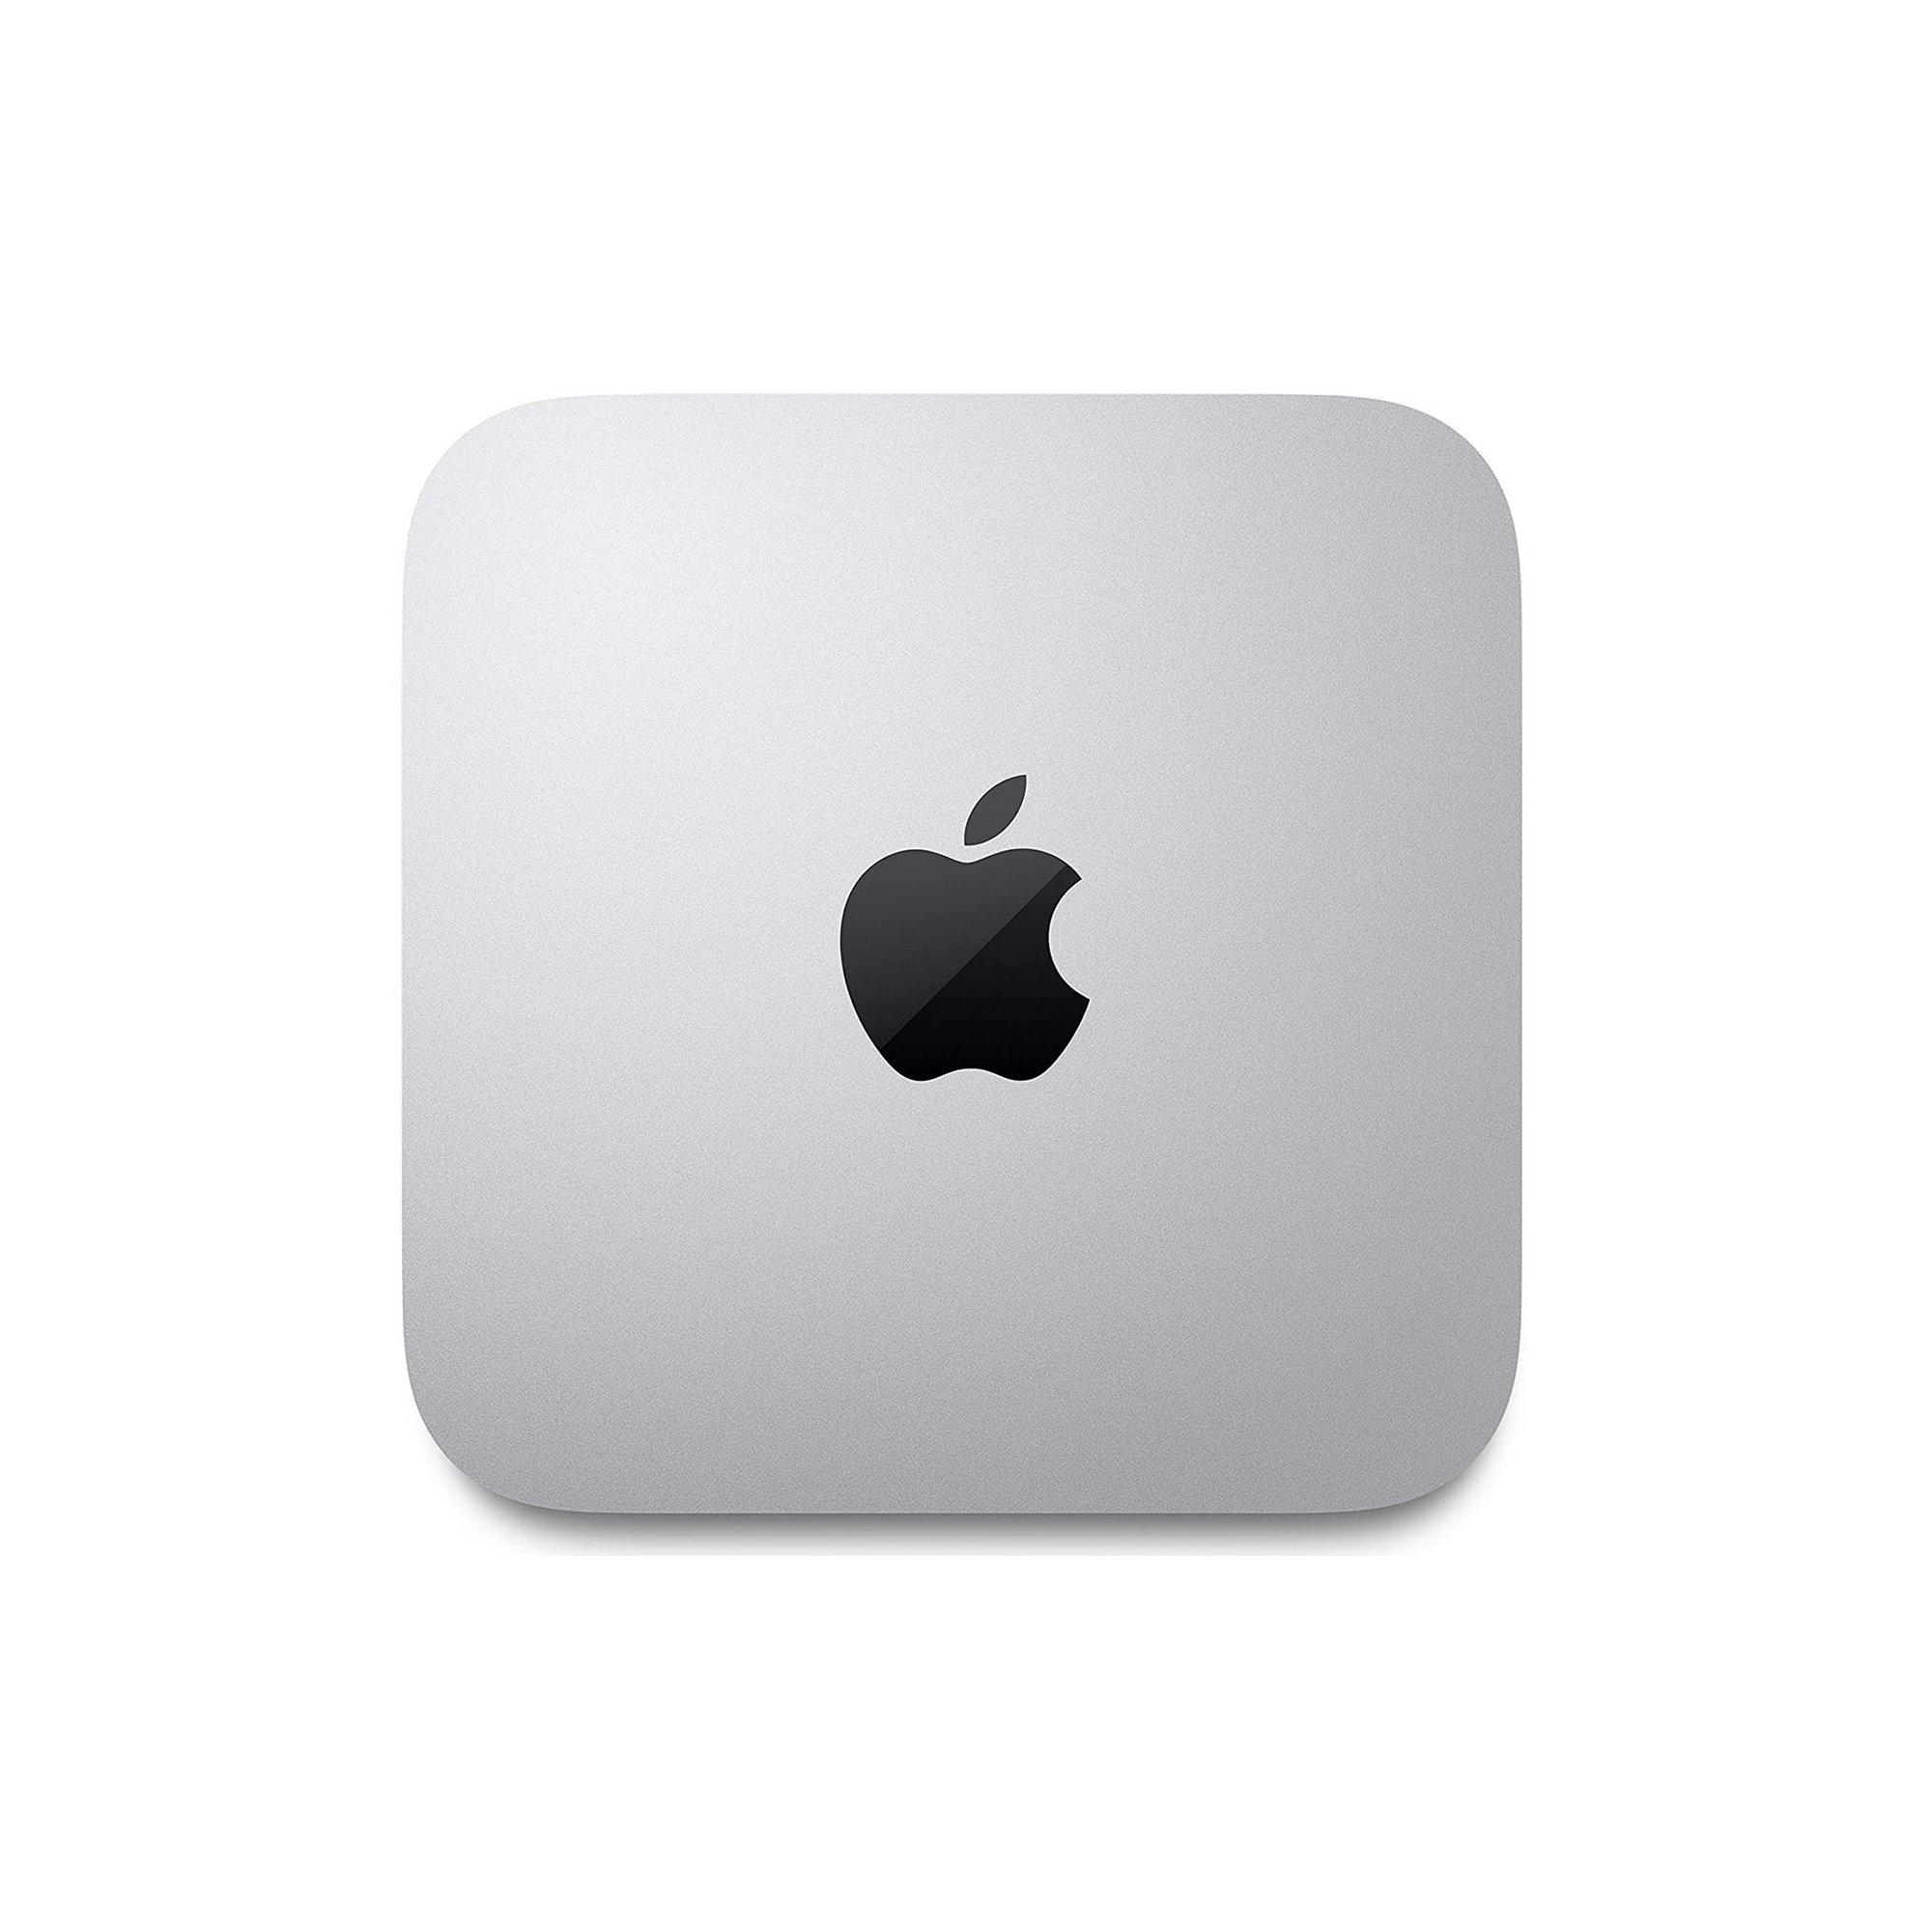 Image of Apple Mac Mini 2020 M1 Chip 256GB Silver